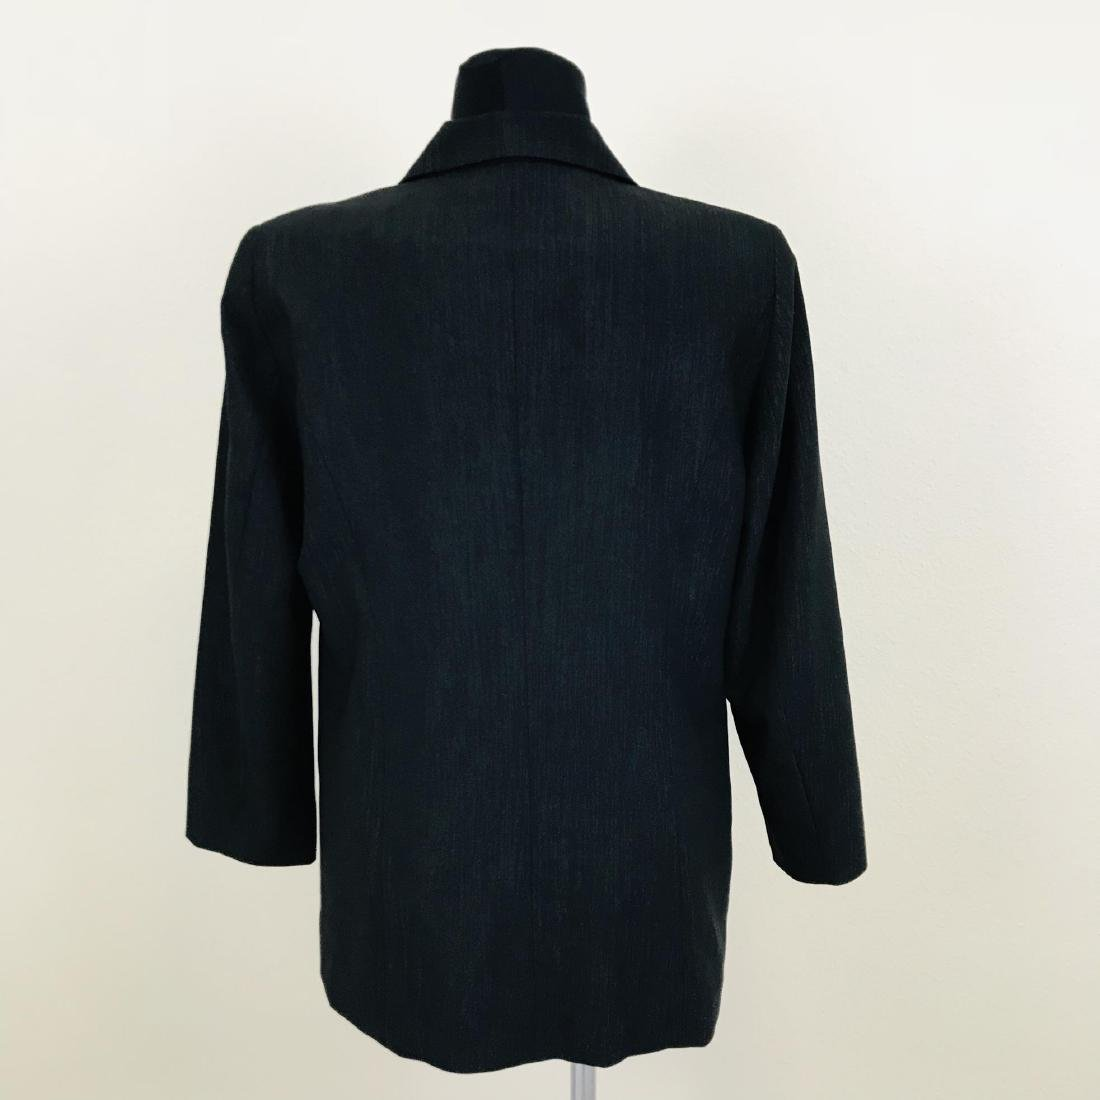 Vintage Women's Blazer Jacket - 5